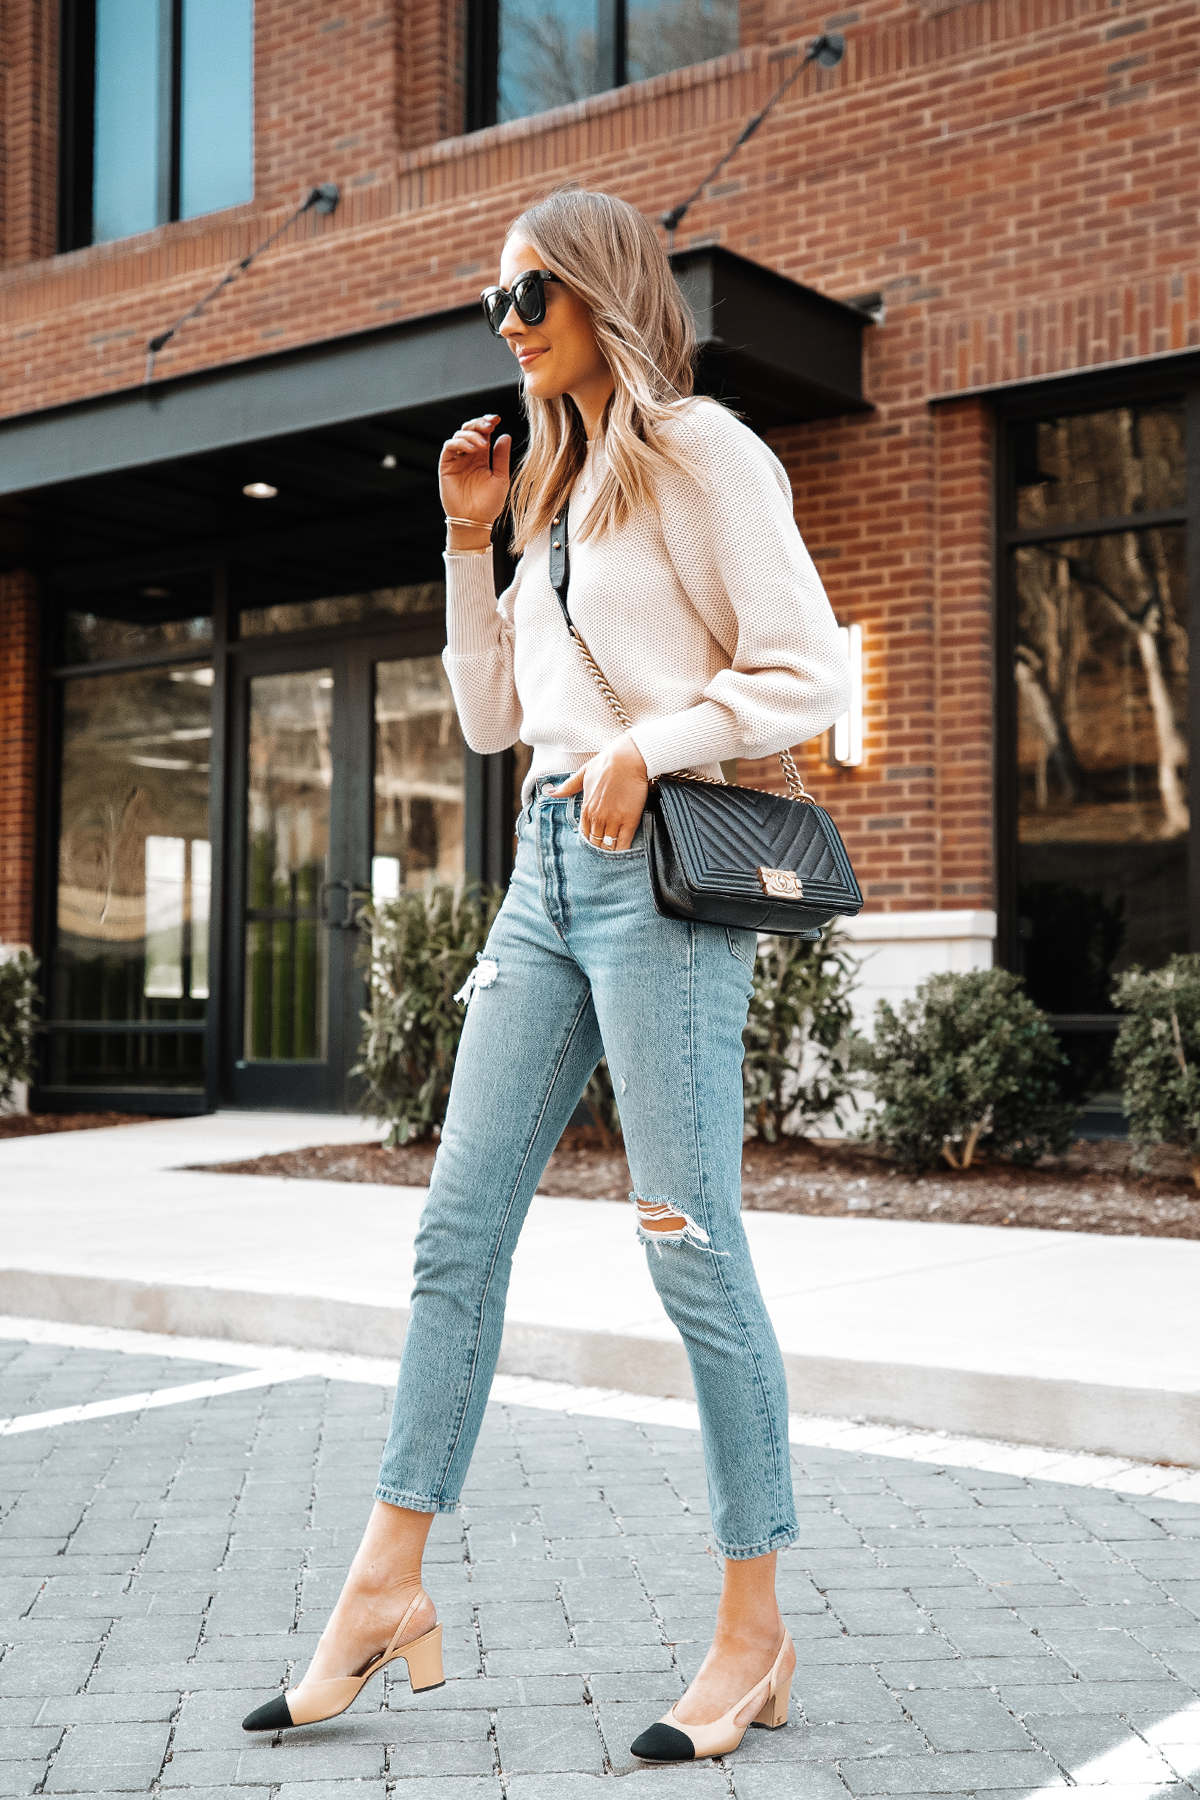 Fashion Jackson Wearing Ann Taylor Beige Knit Sweater Levis Ripped Jeans Chanel Slingbacks Chanel Black Boy Bag 1